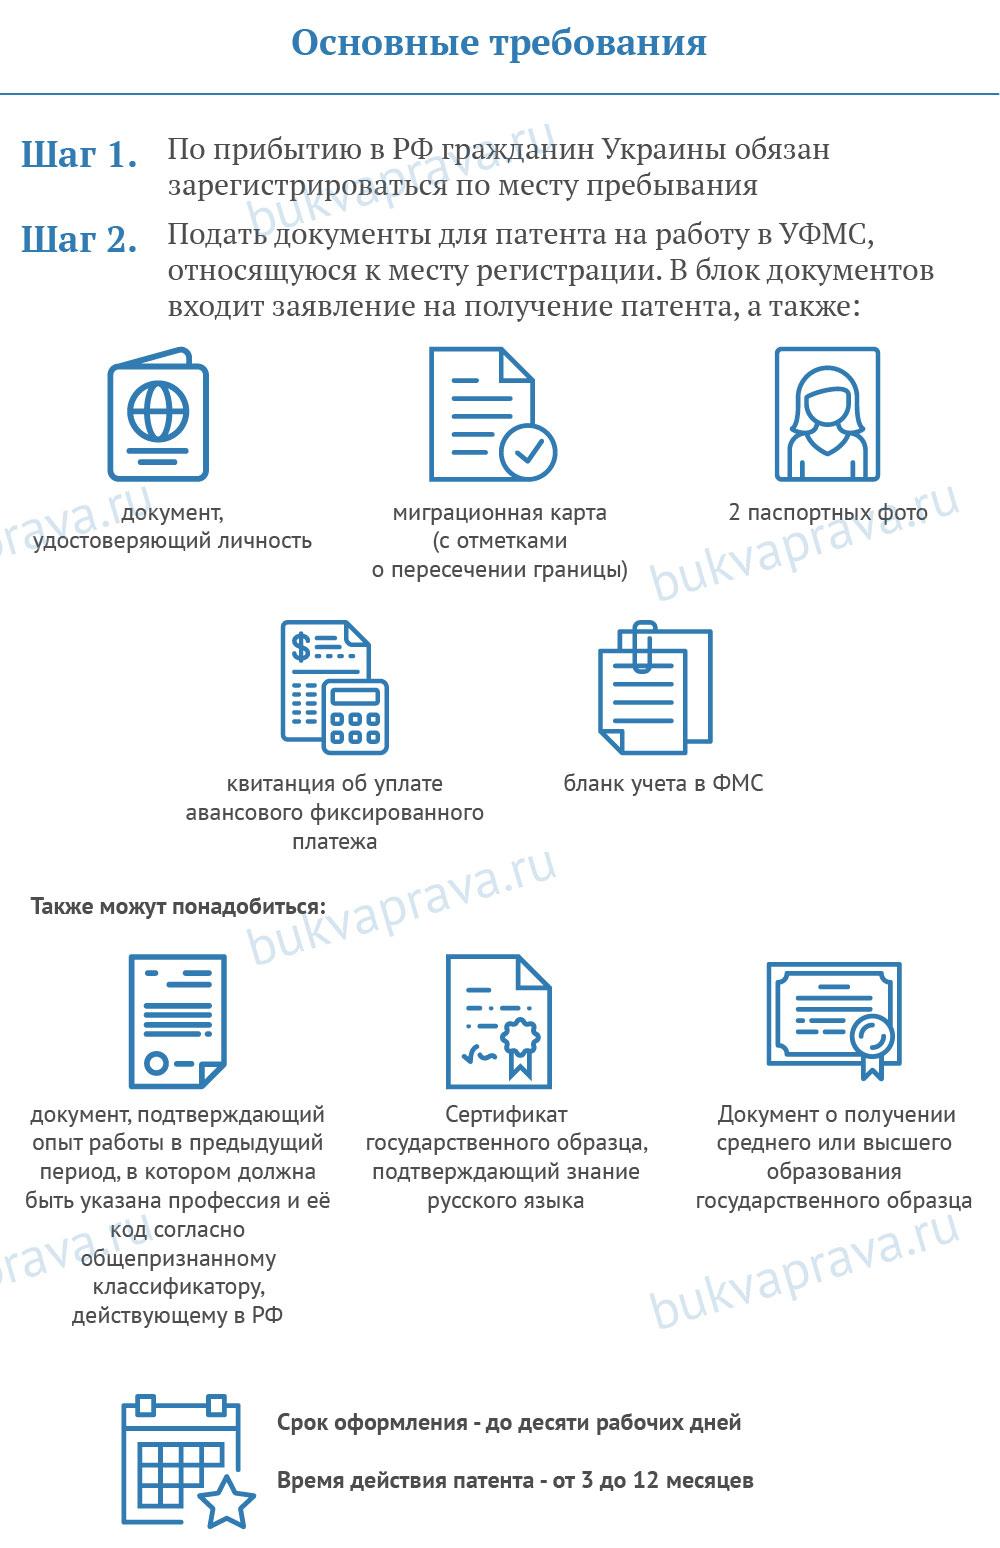 Получение патента на работу в сочи проверка о готовности патент на работе